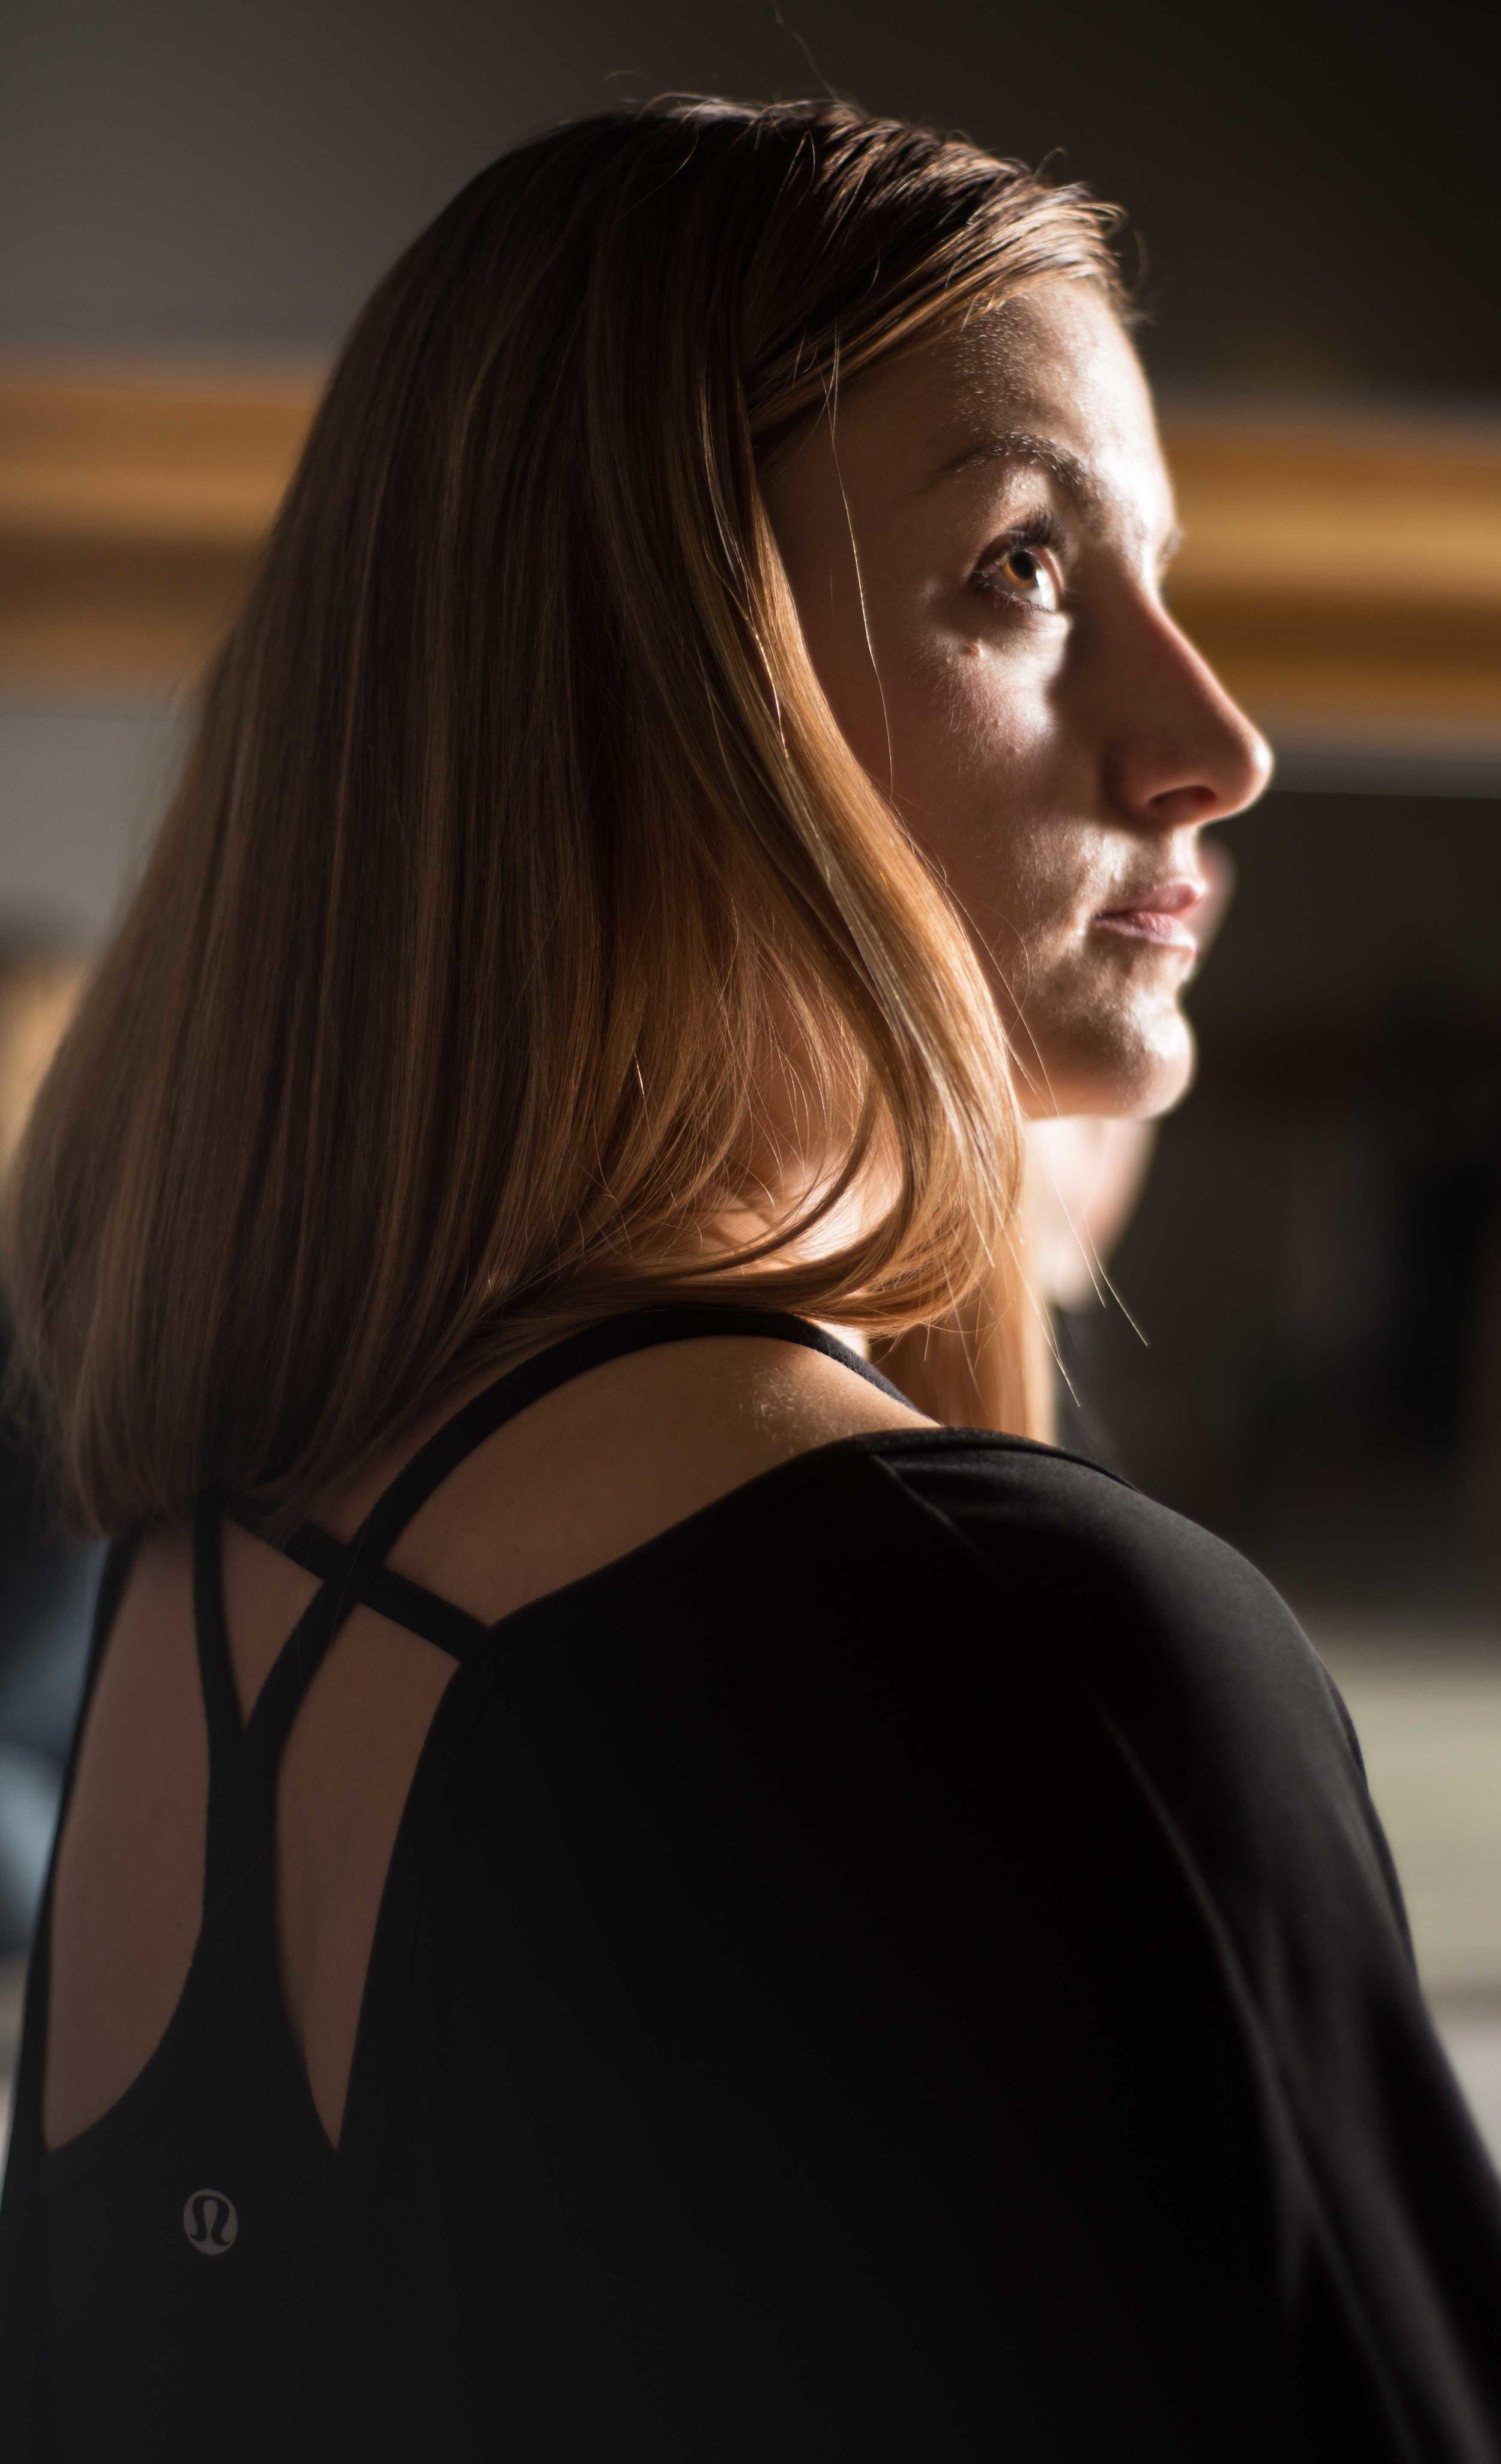 Marzena Wojcik - Urban | Mindful | YoginiPhoto by: Chelsea Lees